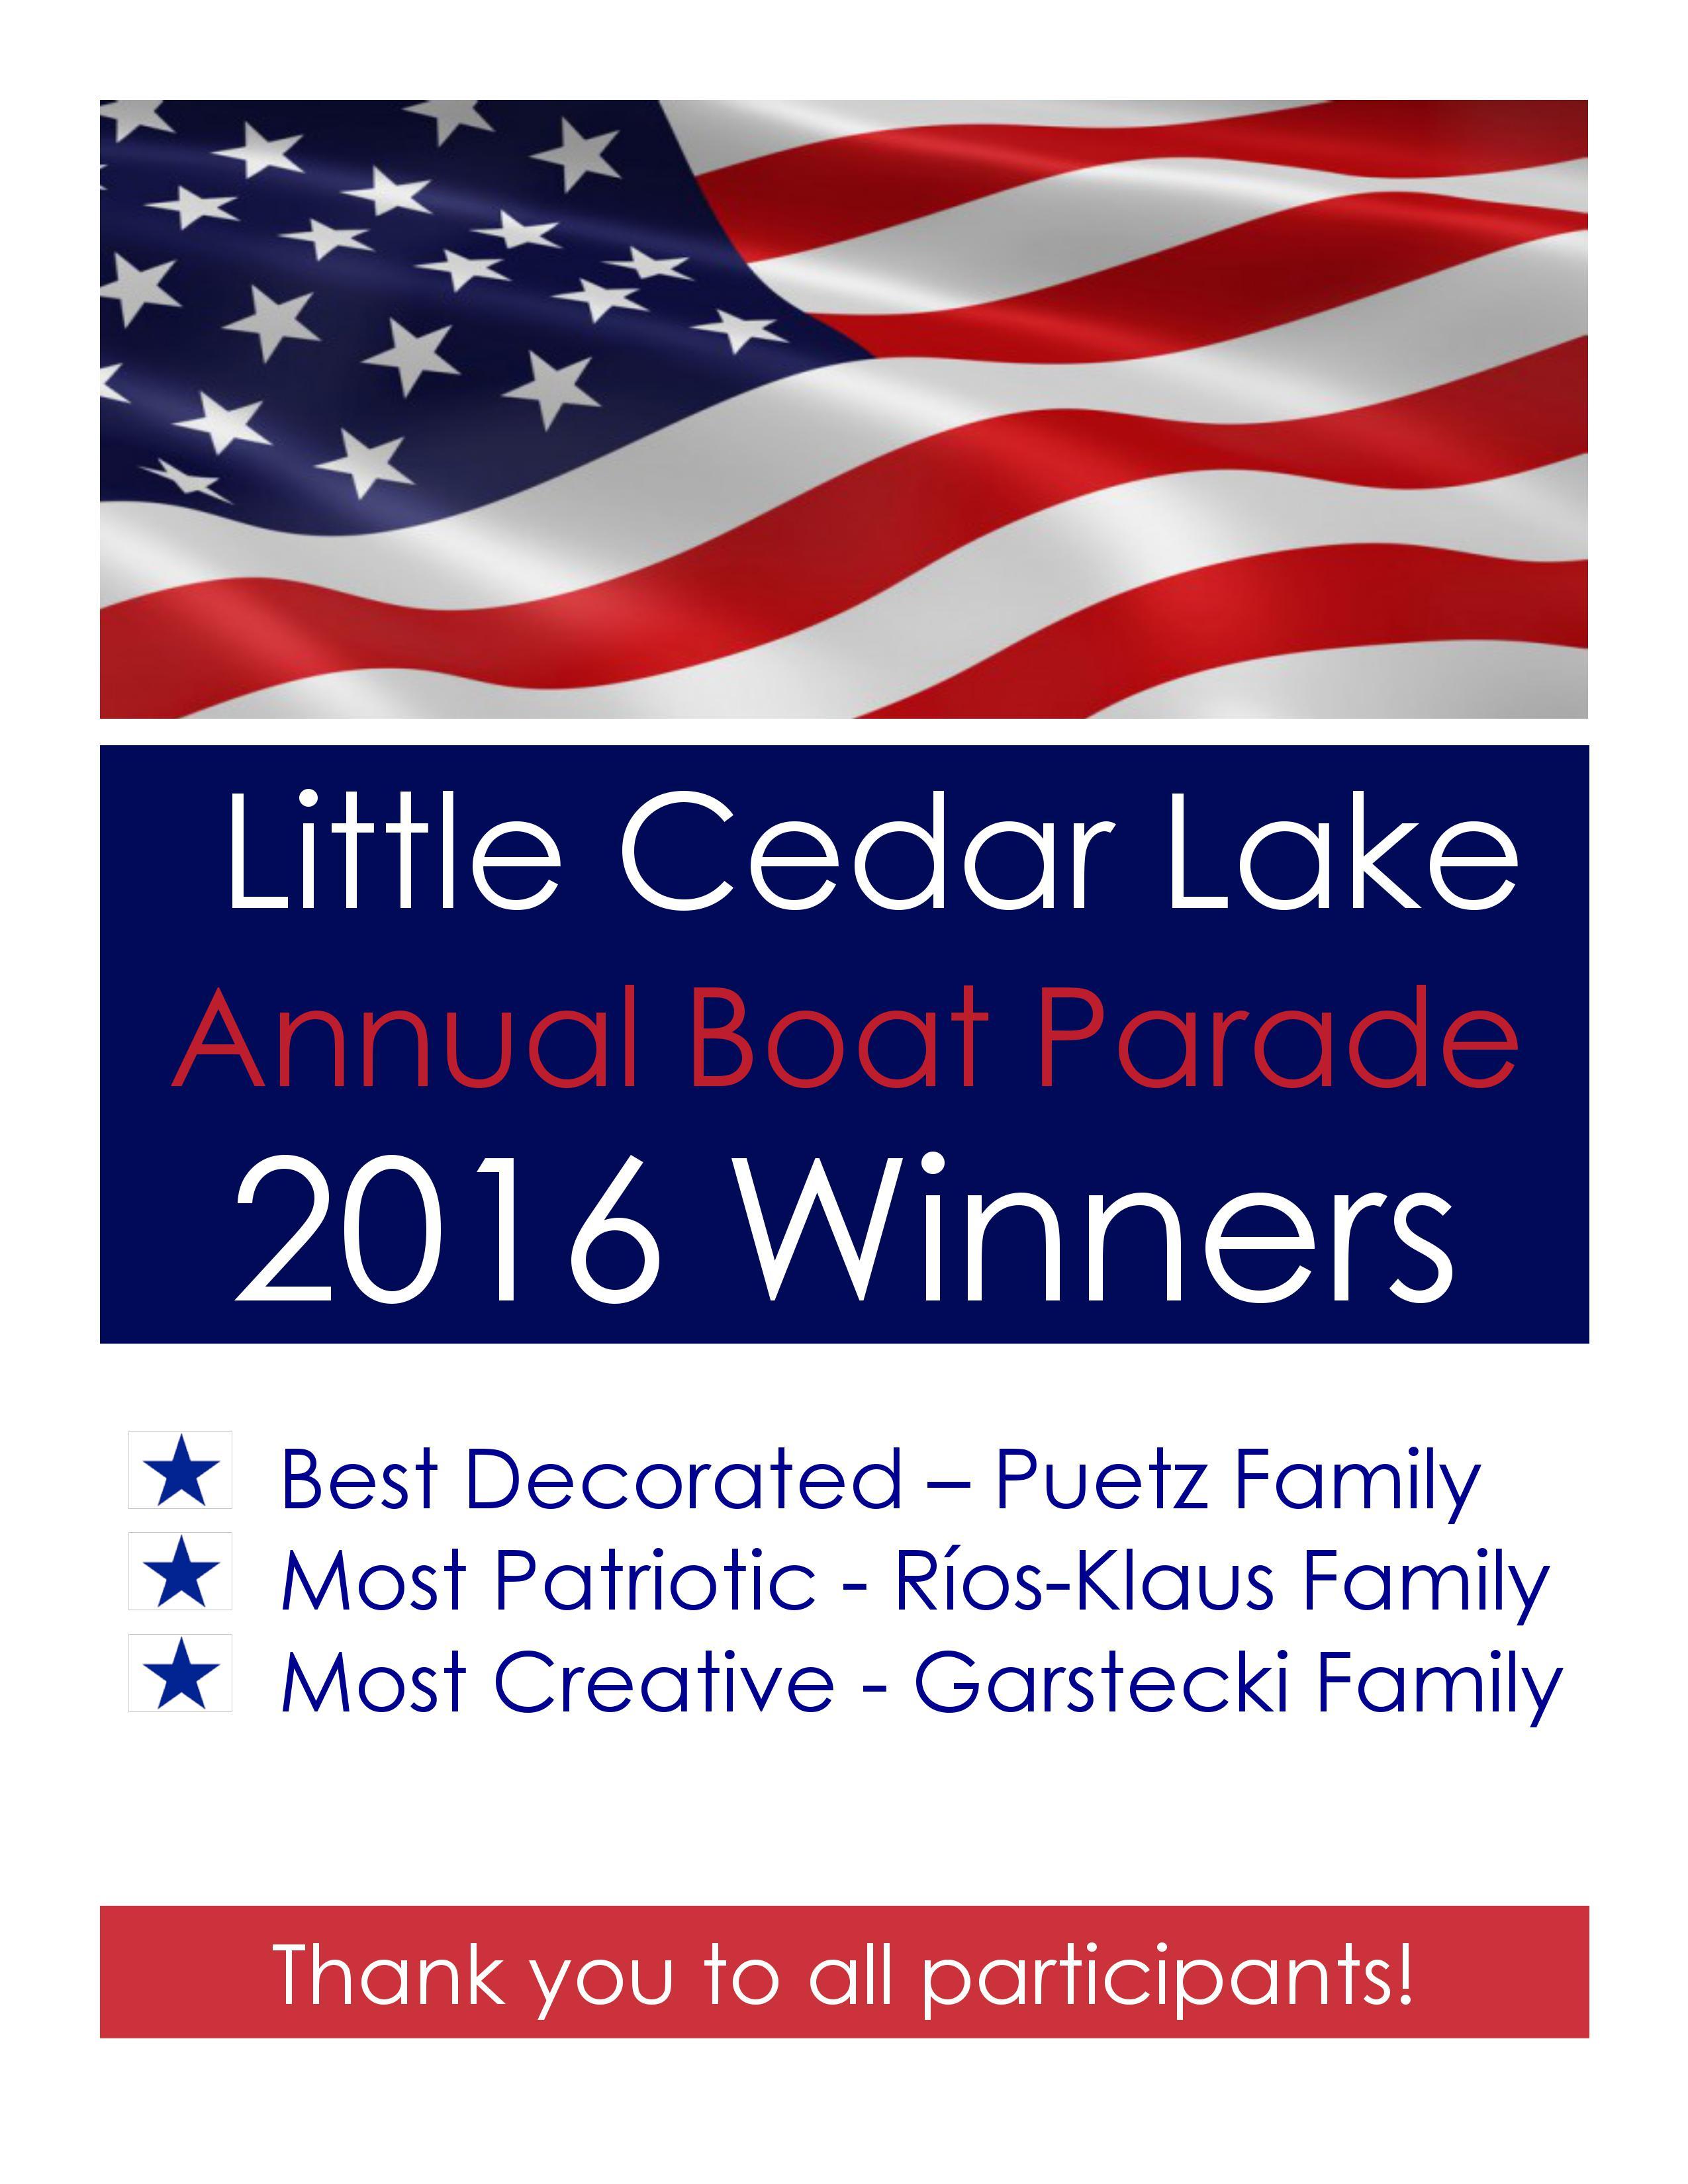 Boat-Parade-2016-Winners